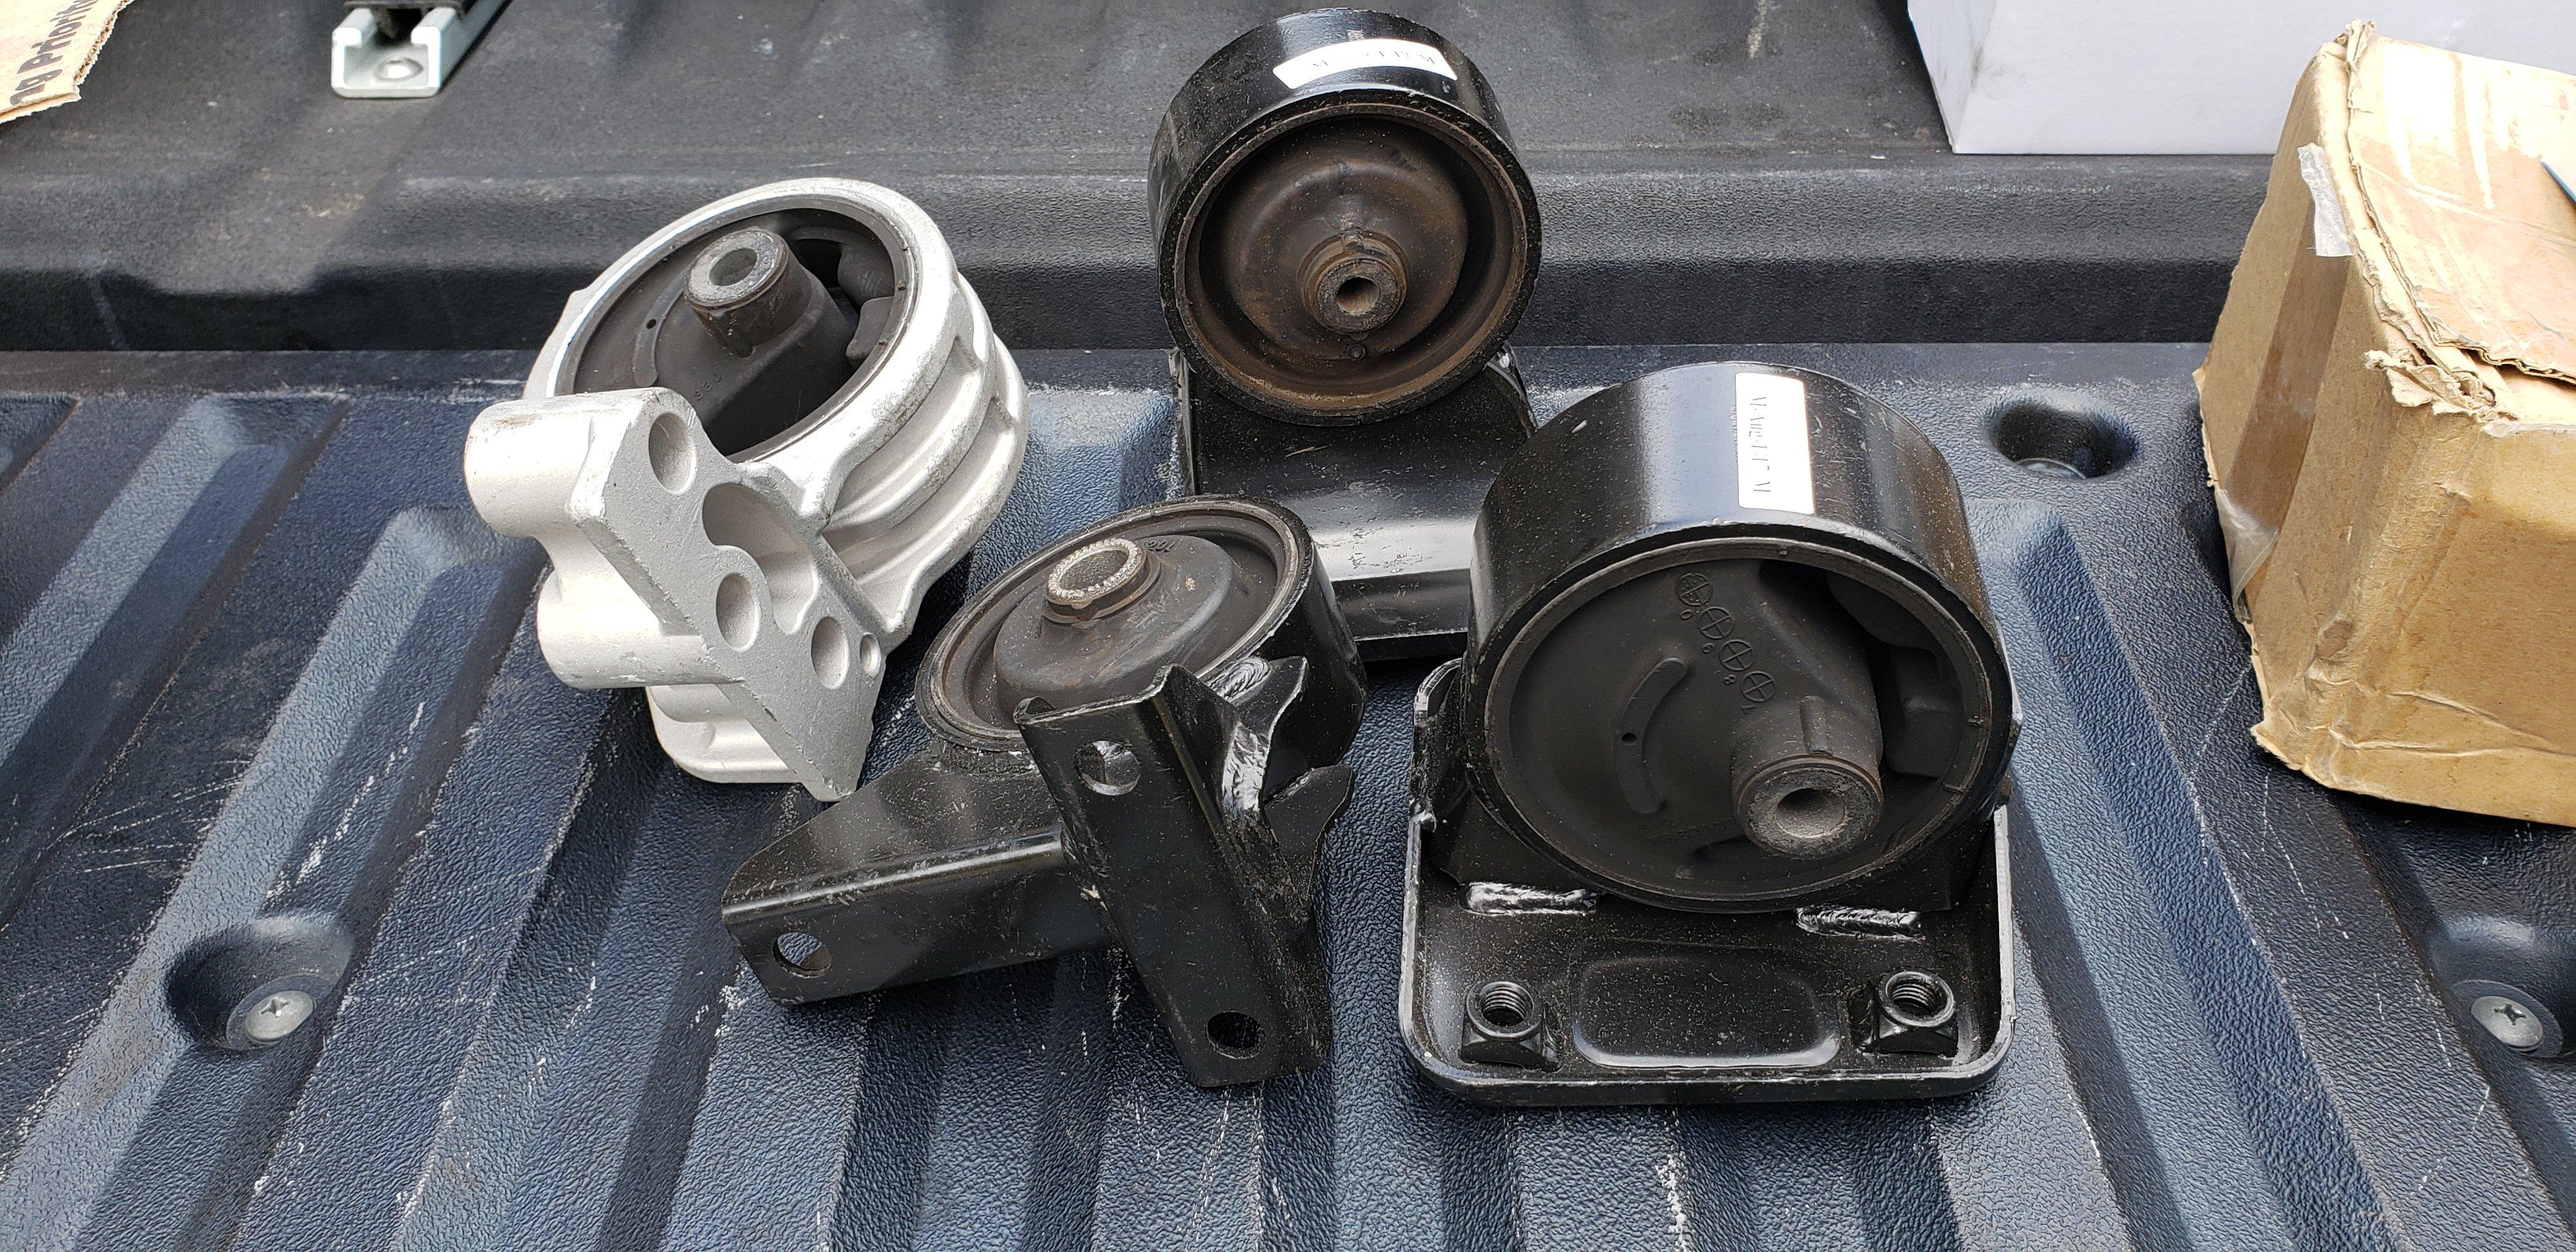 Motor Mounts, all 4 - OEM-20190831_160841_1568818468688.jpg